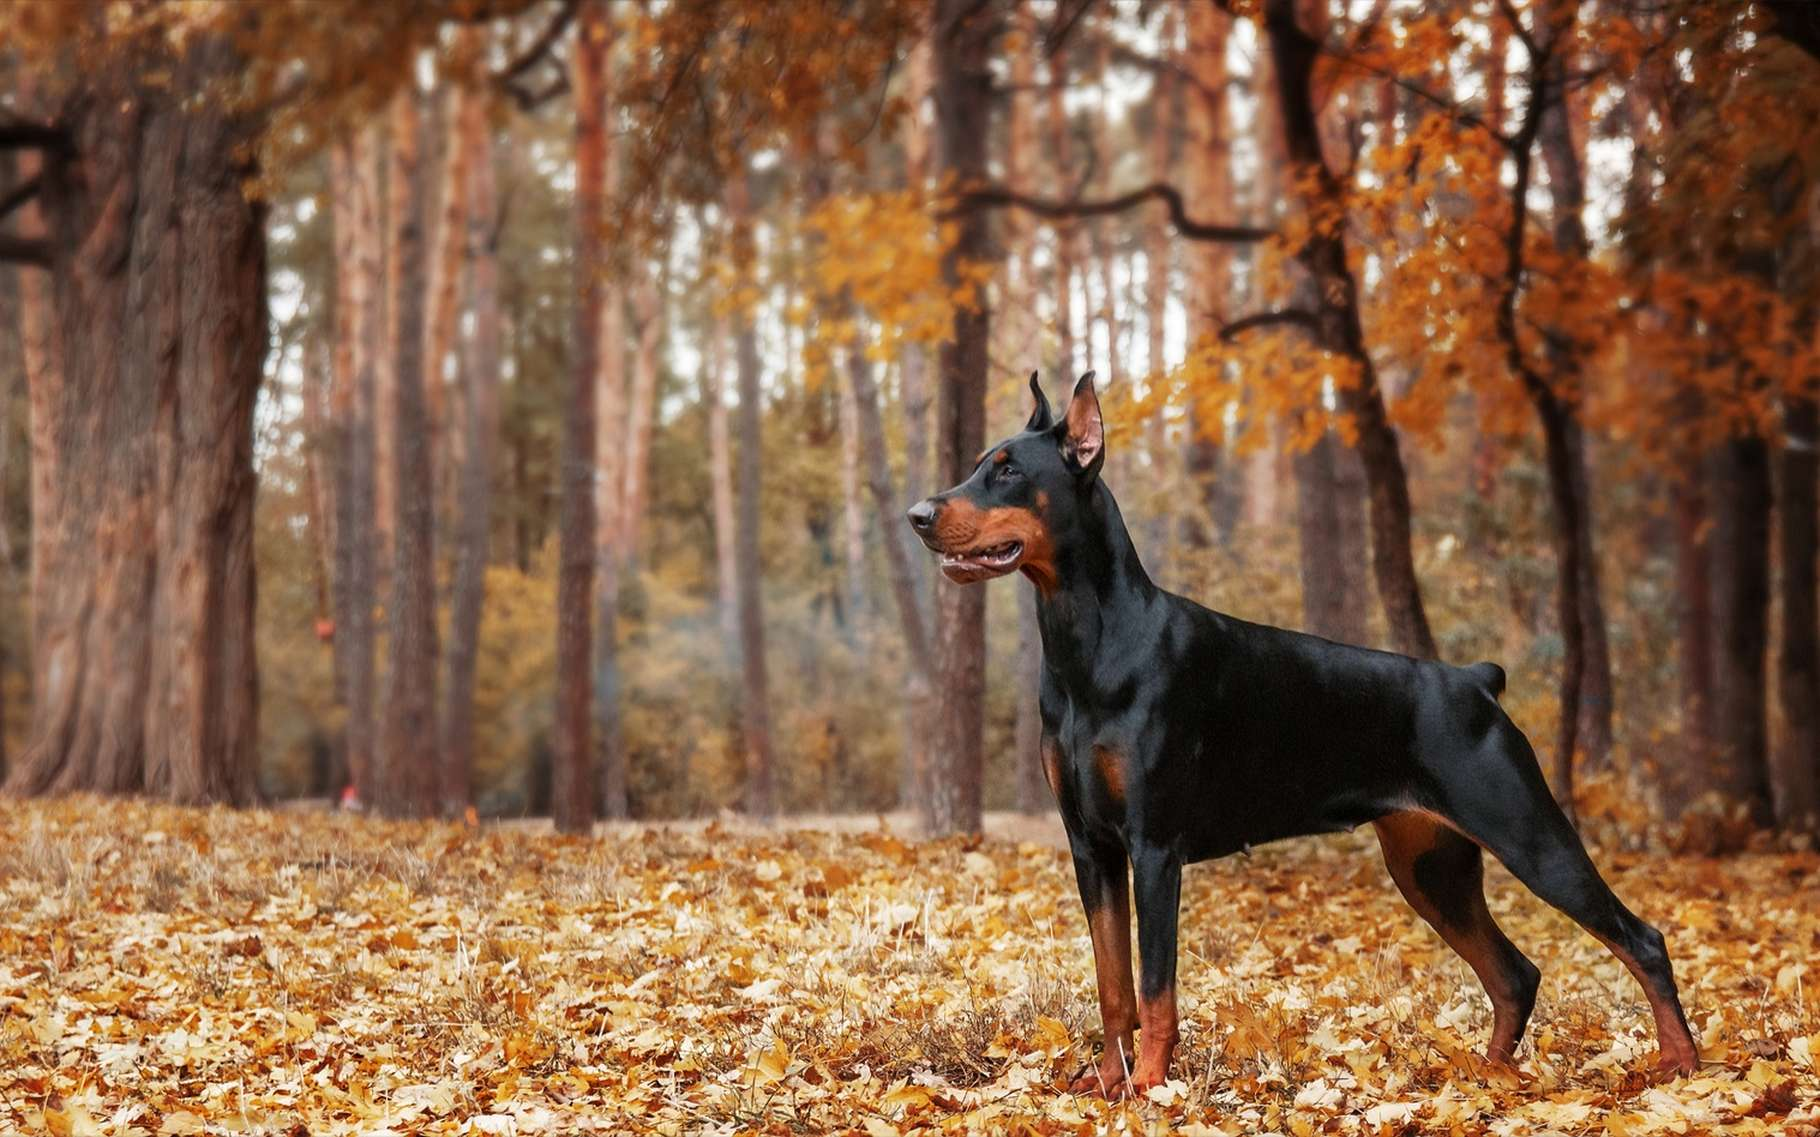 Le doberman est avant tout un chien de garde. © OlgaOvcharenko, Shutterstock